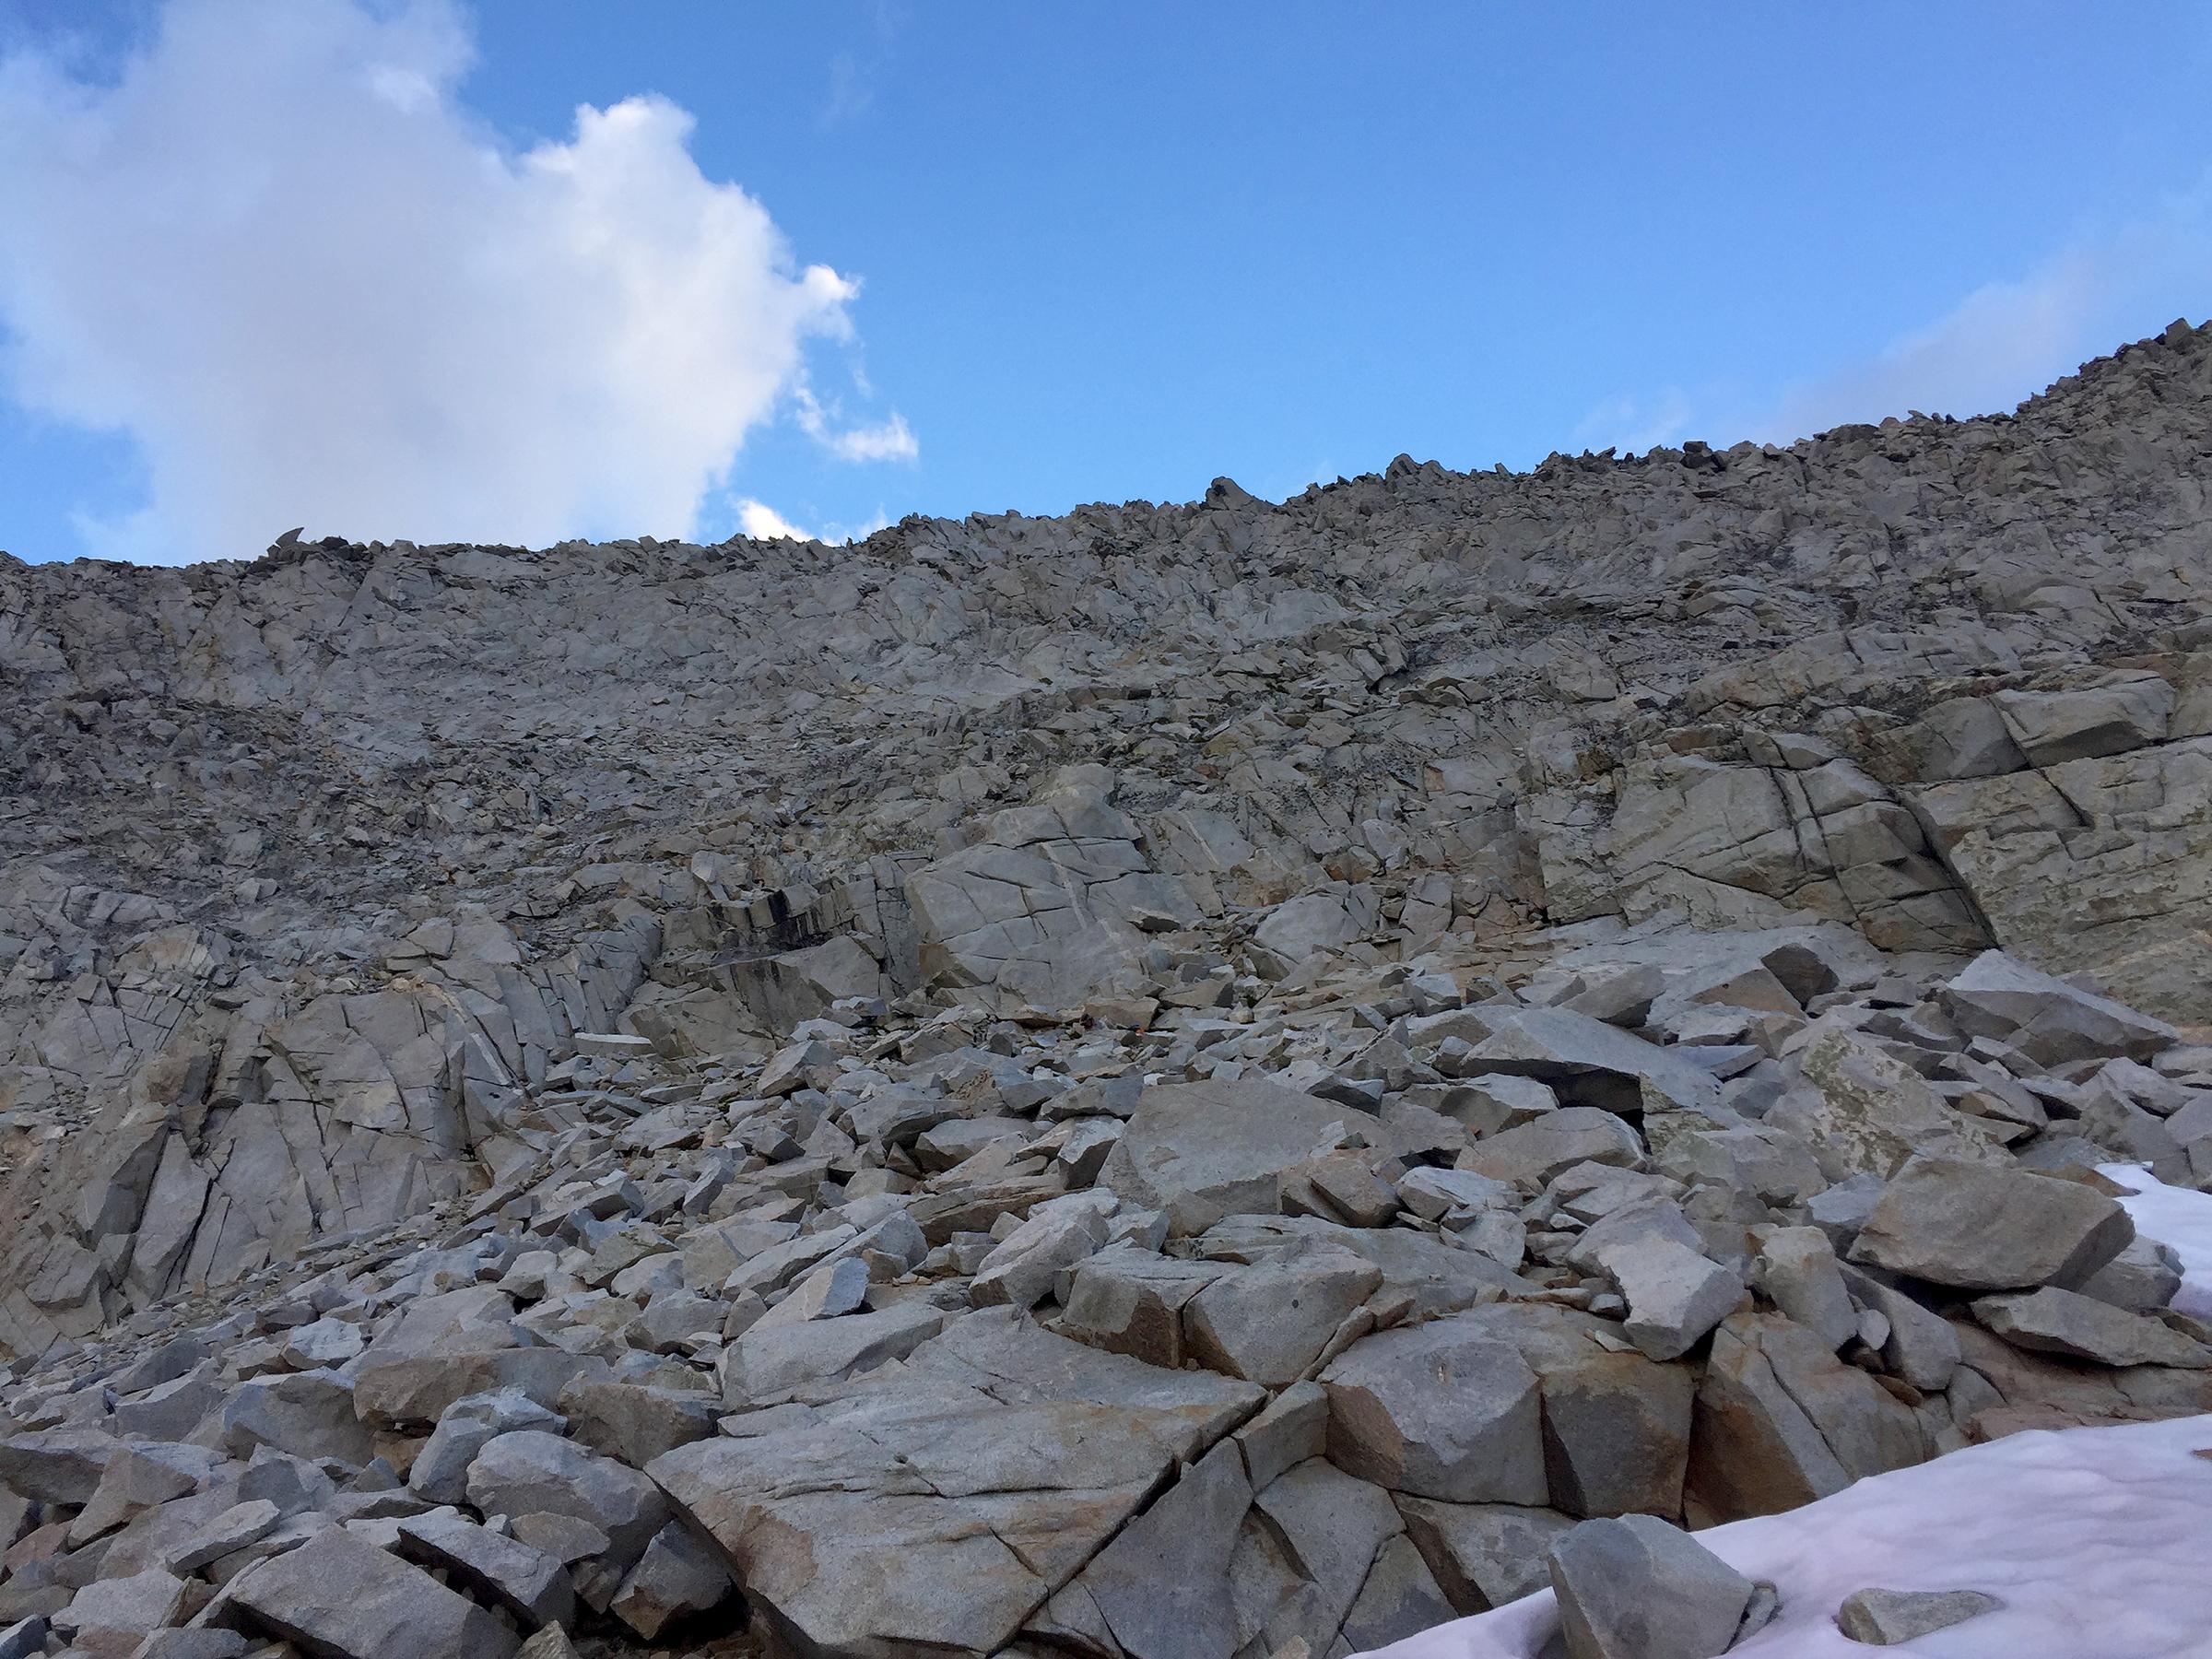 trailname-backstroke-sierra-high-route-2017_0963.jpg